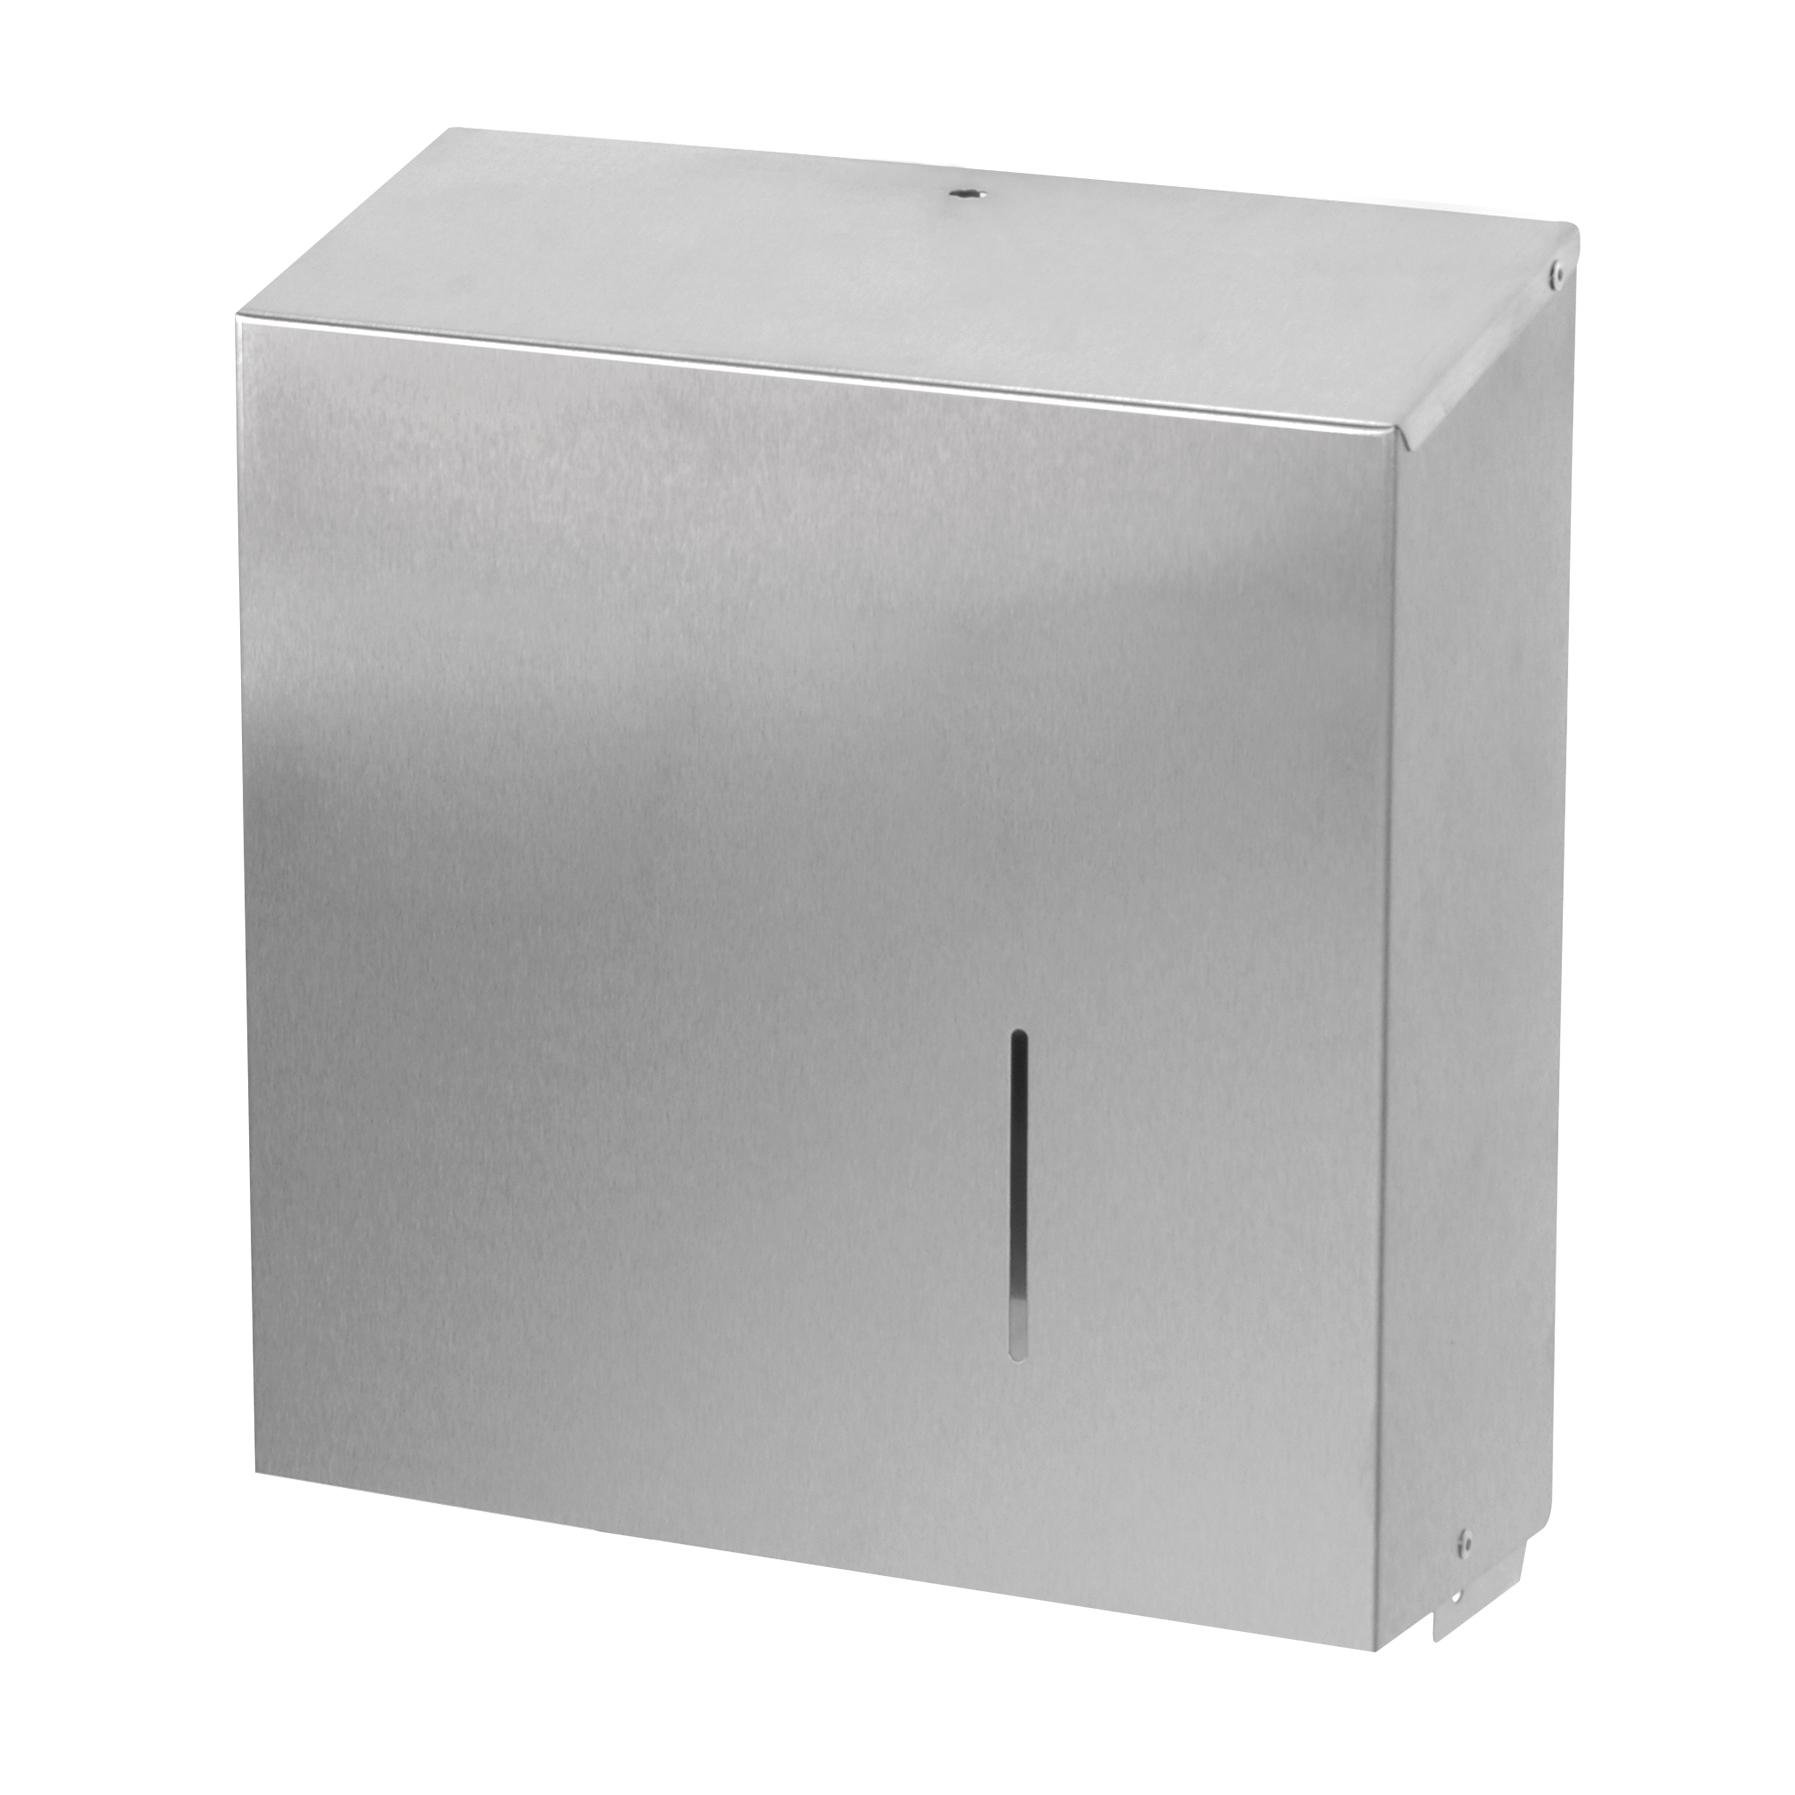 PLS jumbo toiletpapierdispenser rvs